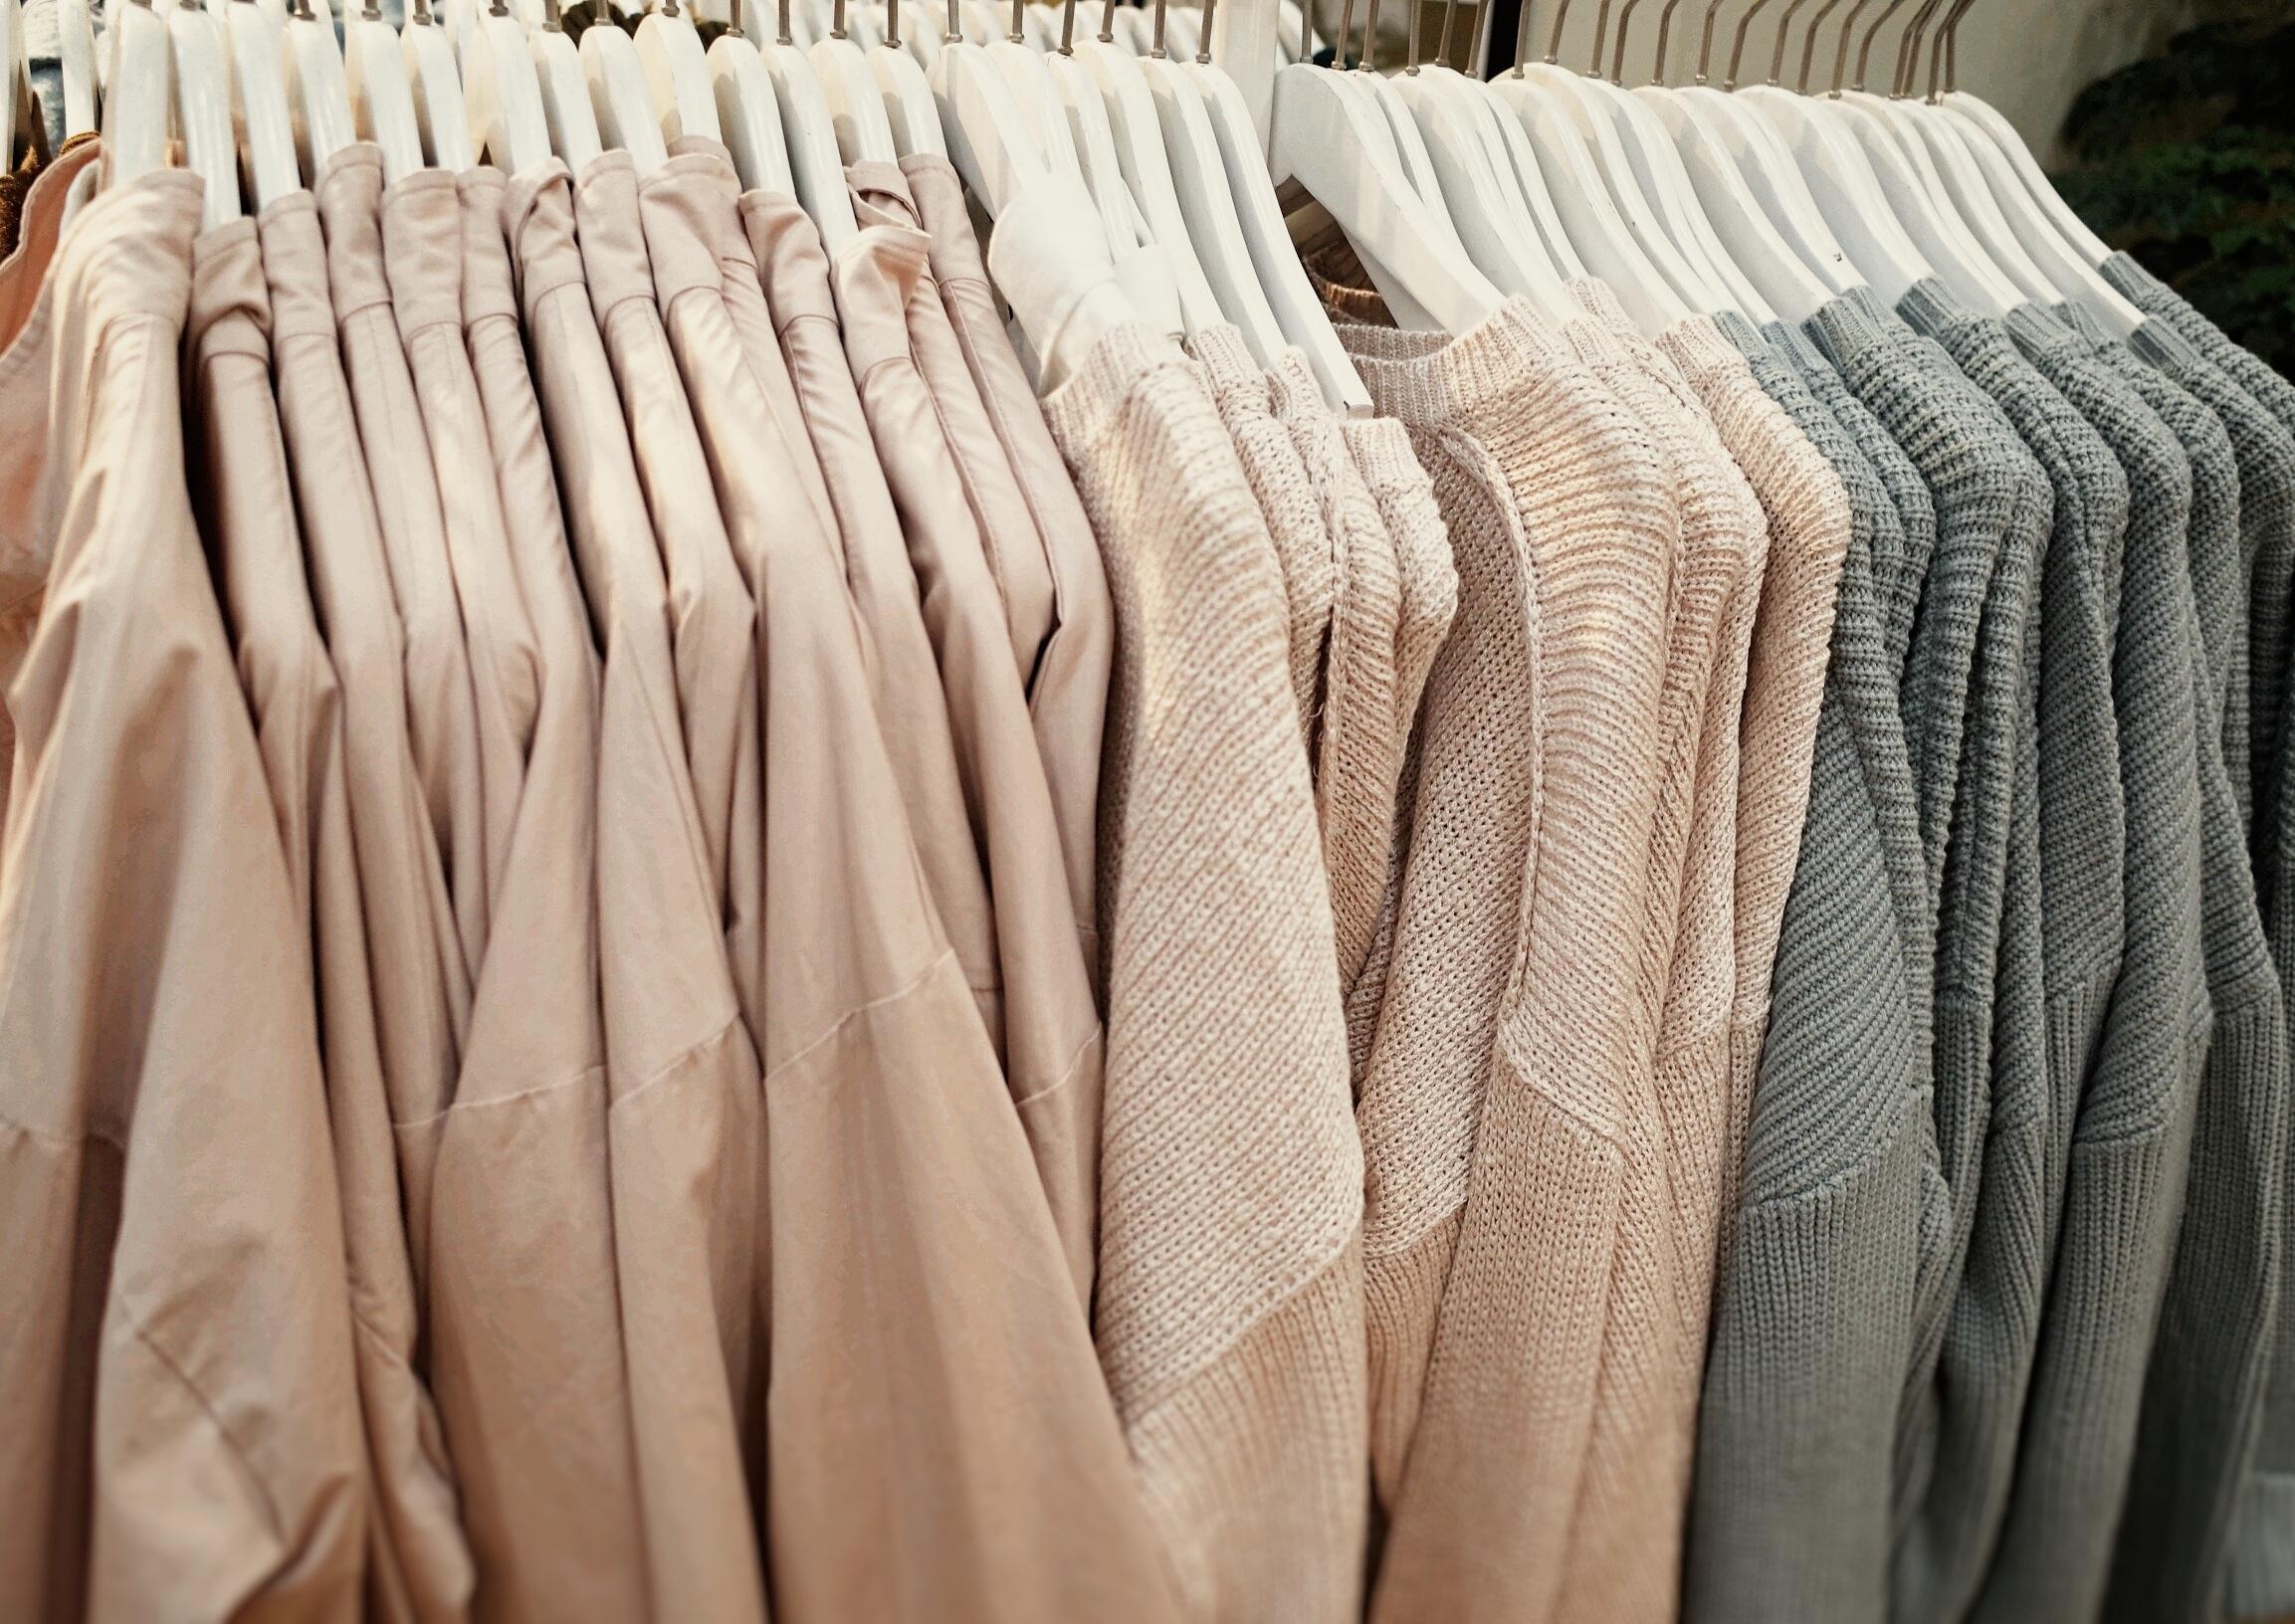 Free Images : hanger, shop, magazine, show, autumn, curtain, shelf ...